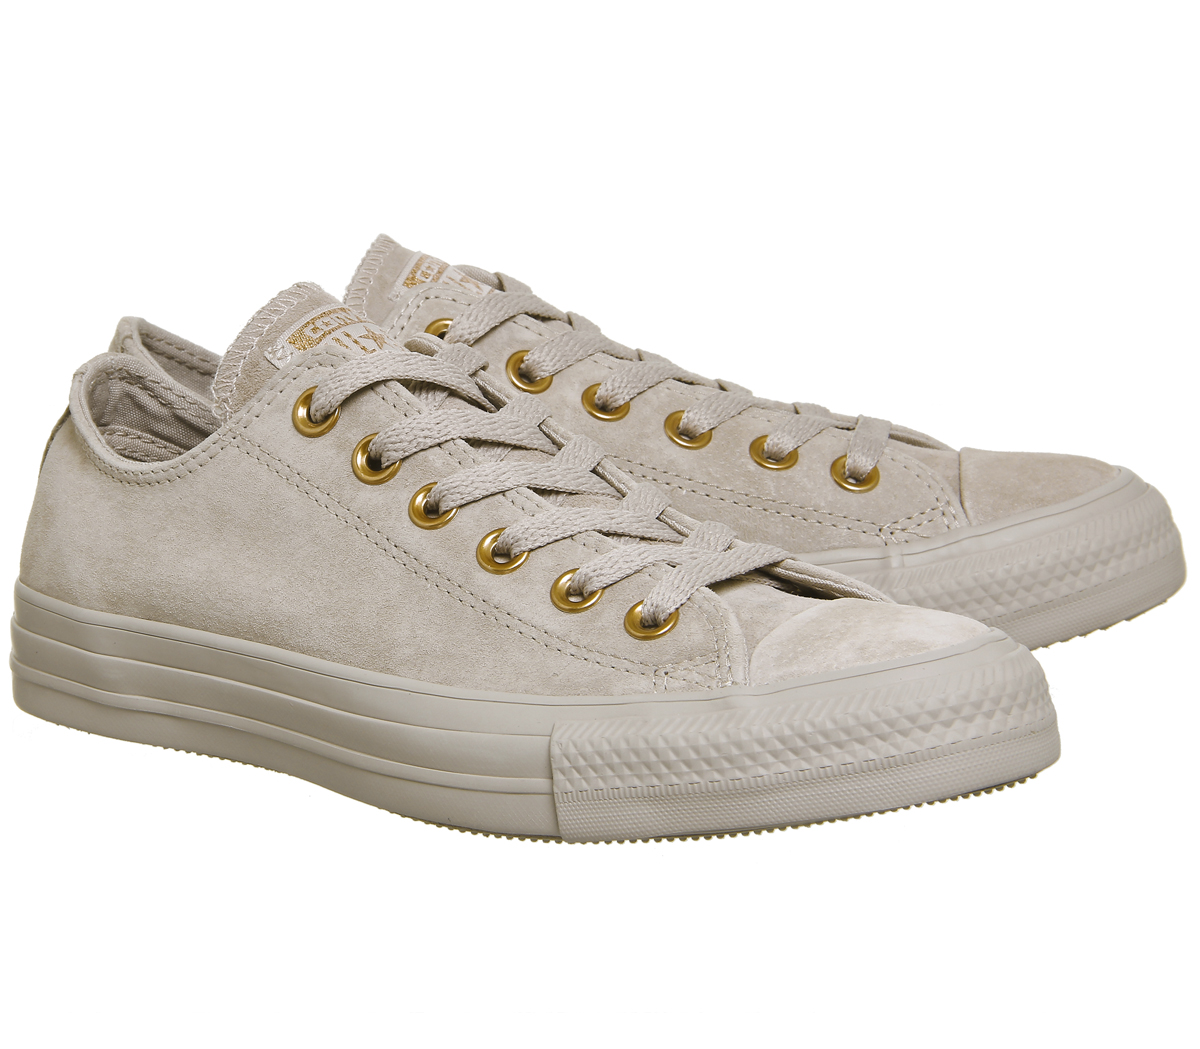 Damenschuhe Converse All Star Niedrig  Leder MUSHROOM BLUSH GOLD  Niedrig Trainers Schuhes 7fbf22